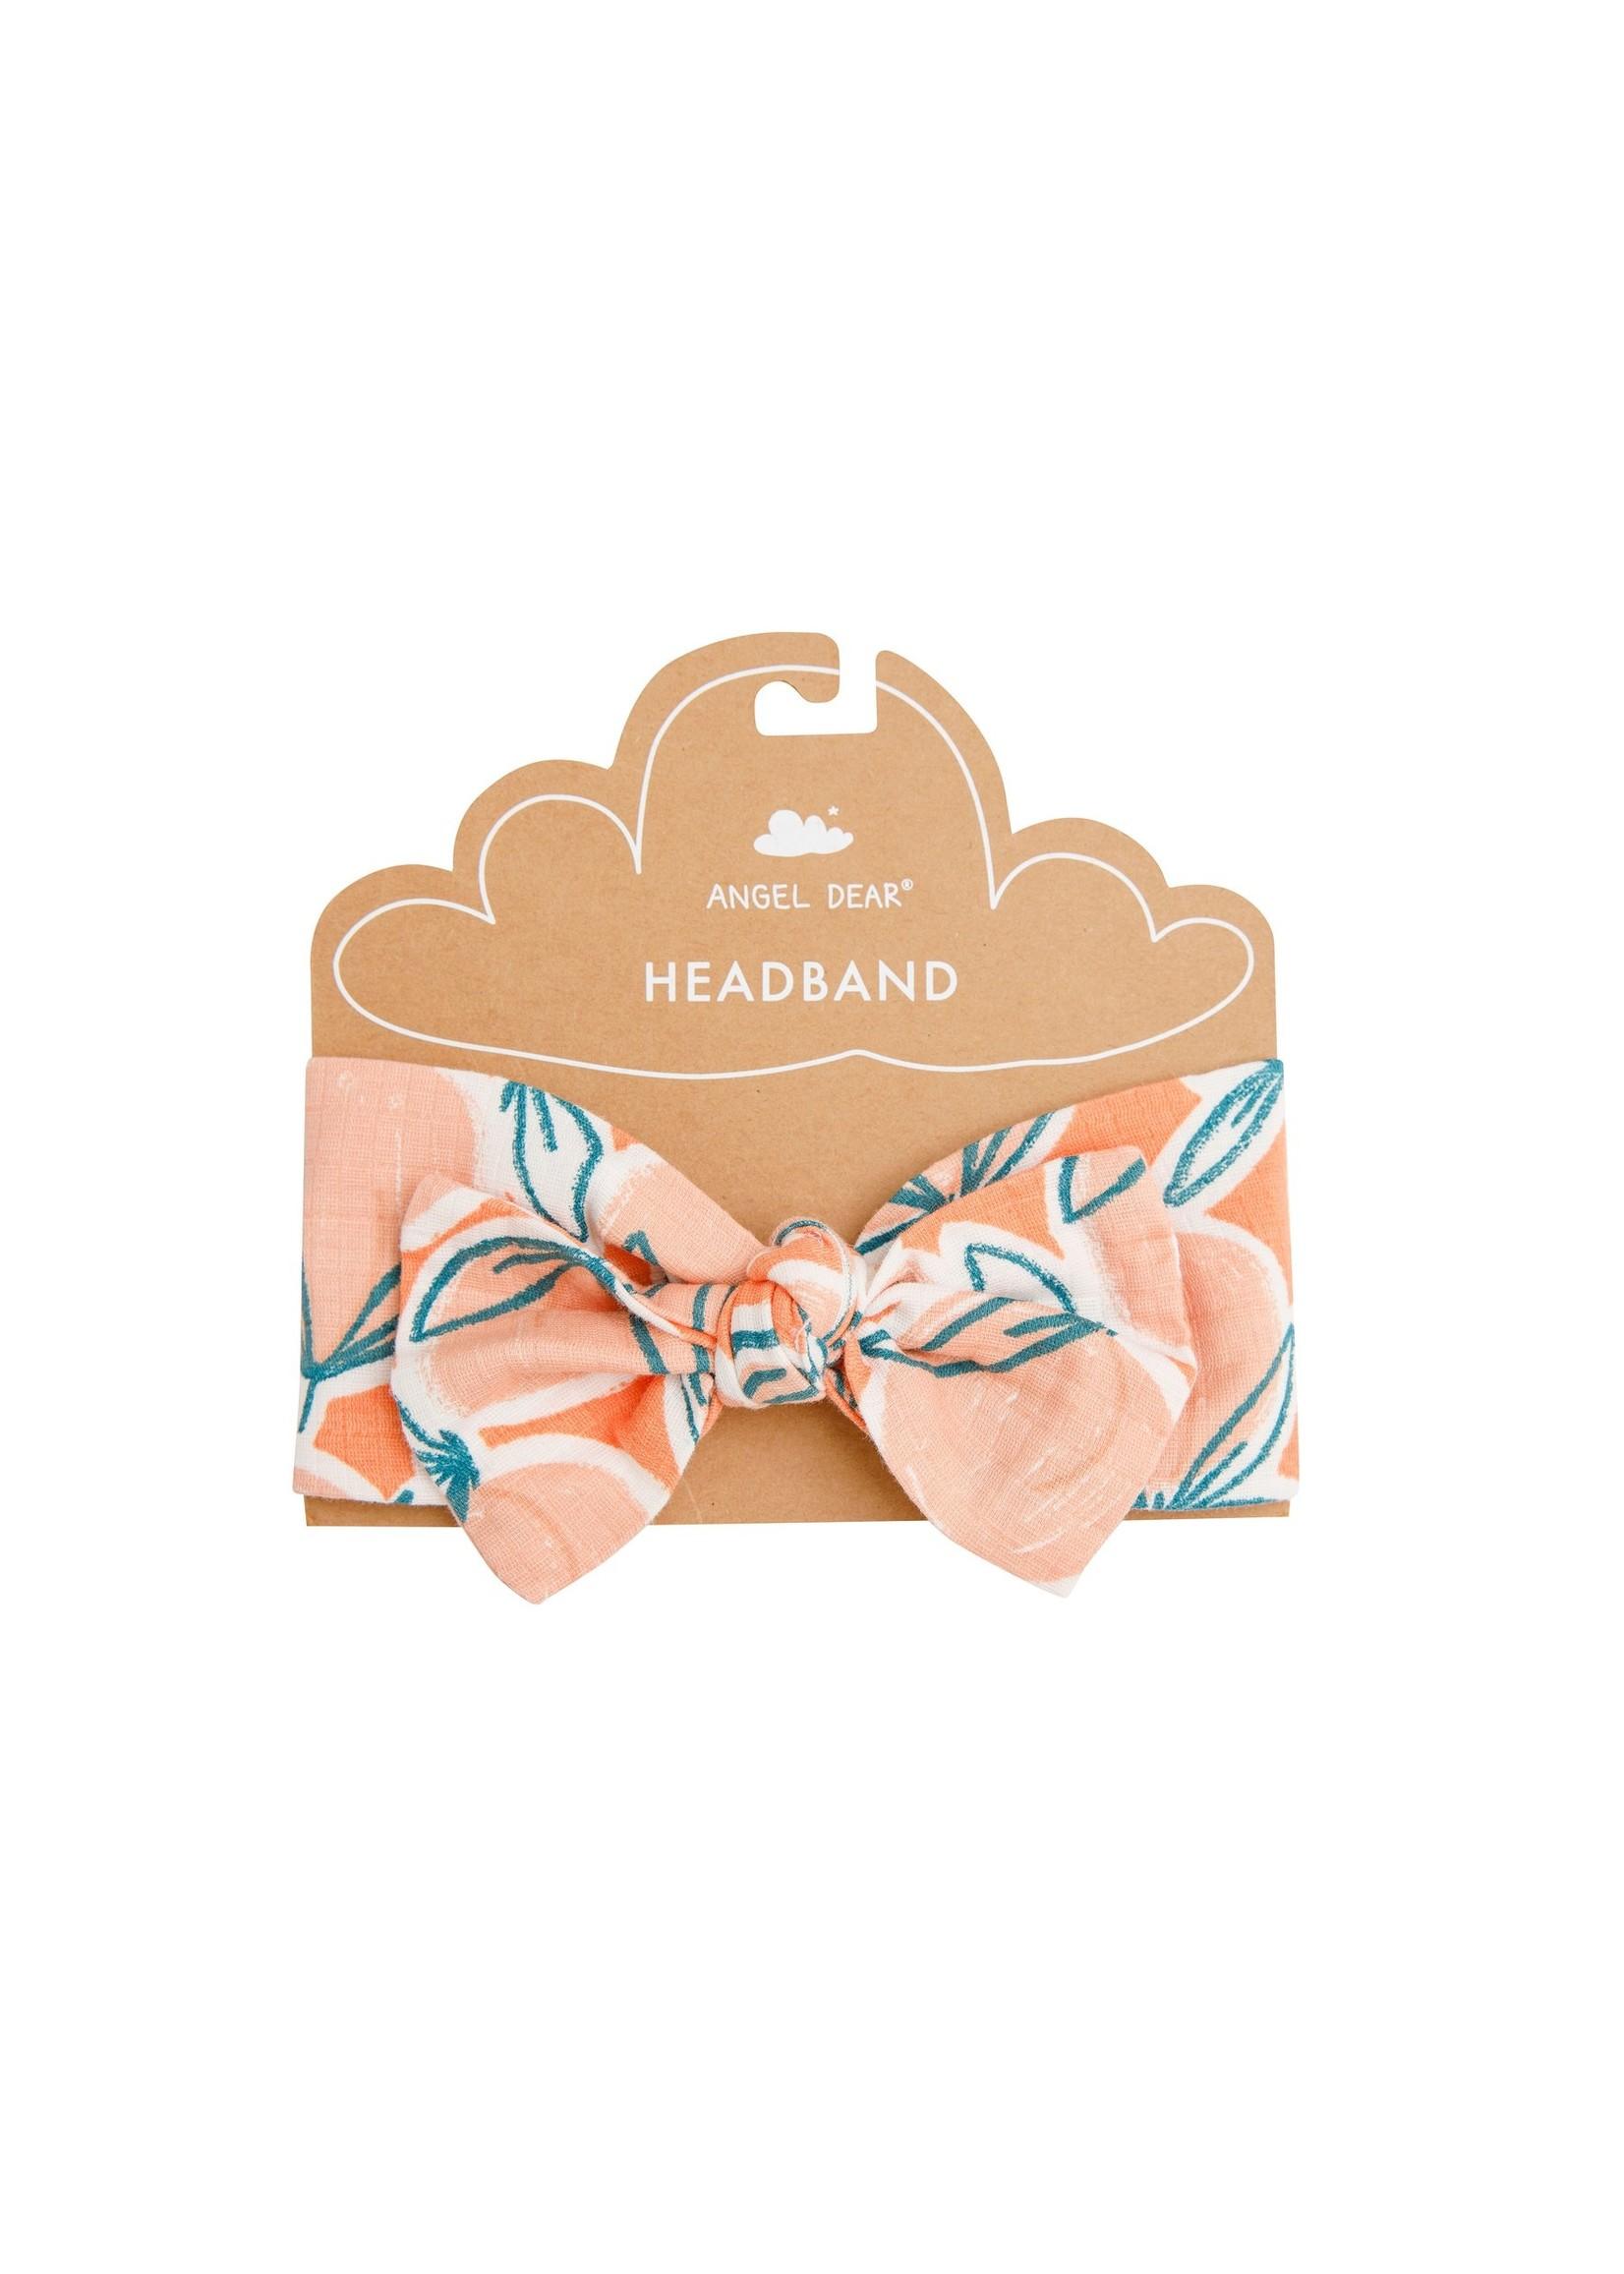 Angel Dear Peachy Cantaloupe Headband